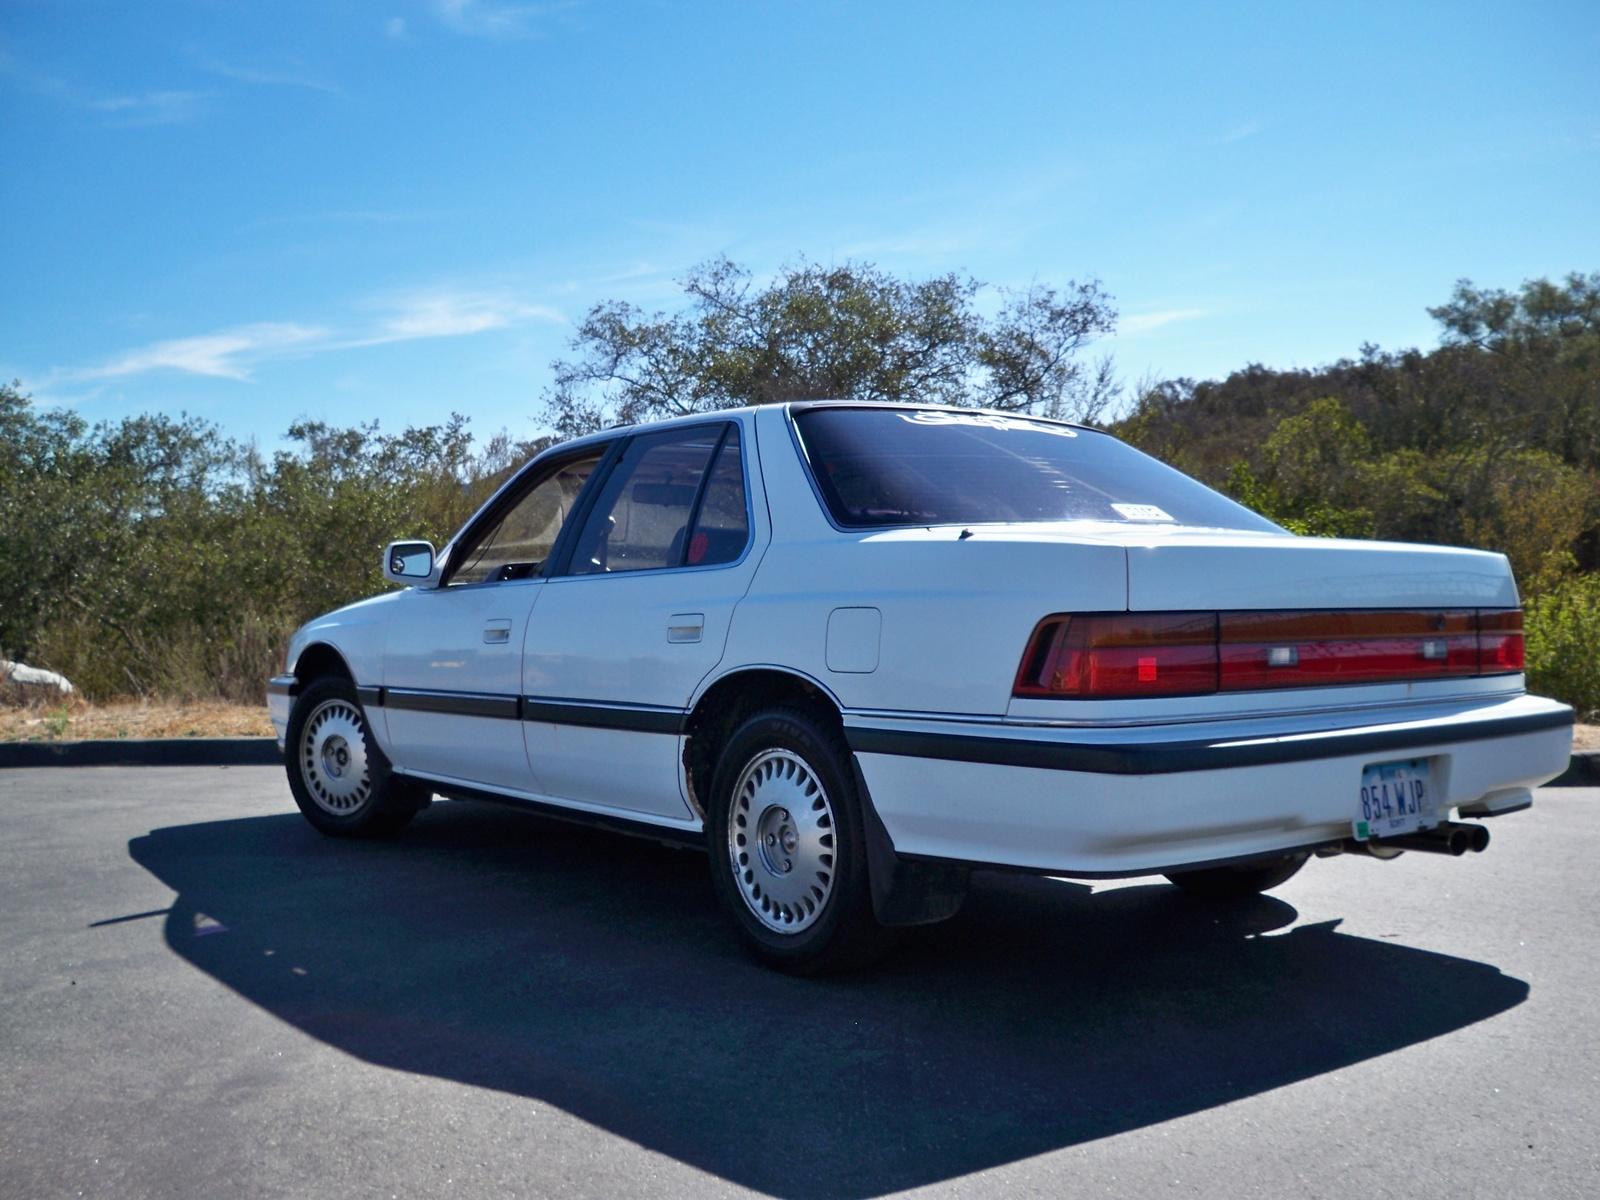 Acura Legend Dr Ls Sedan Pic on 1991 Acura Legend Ls